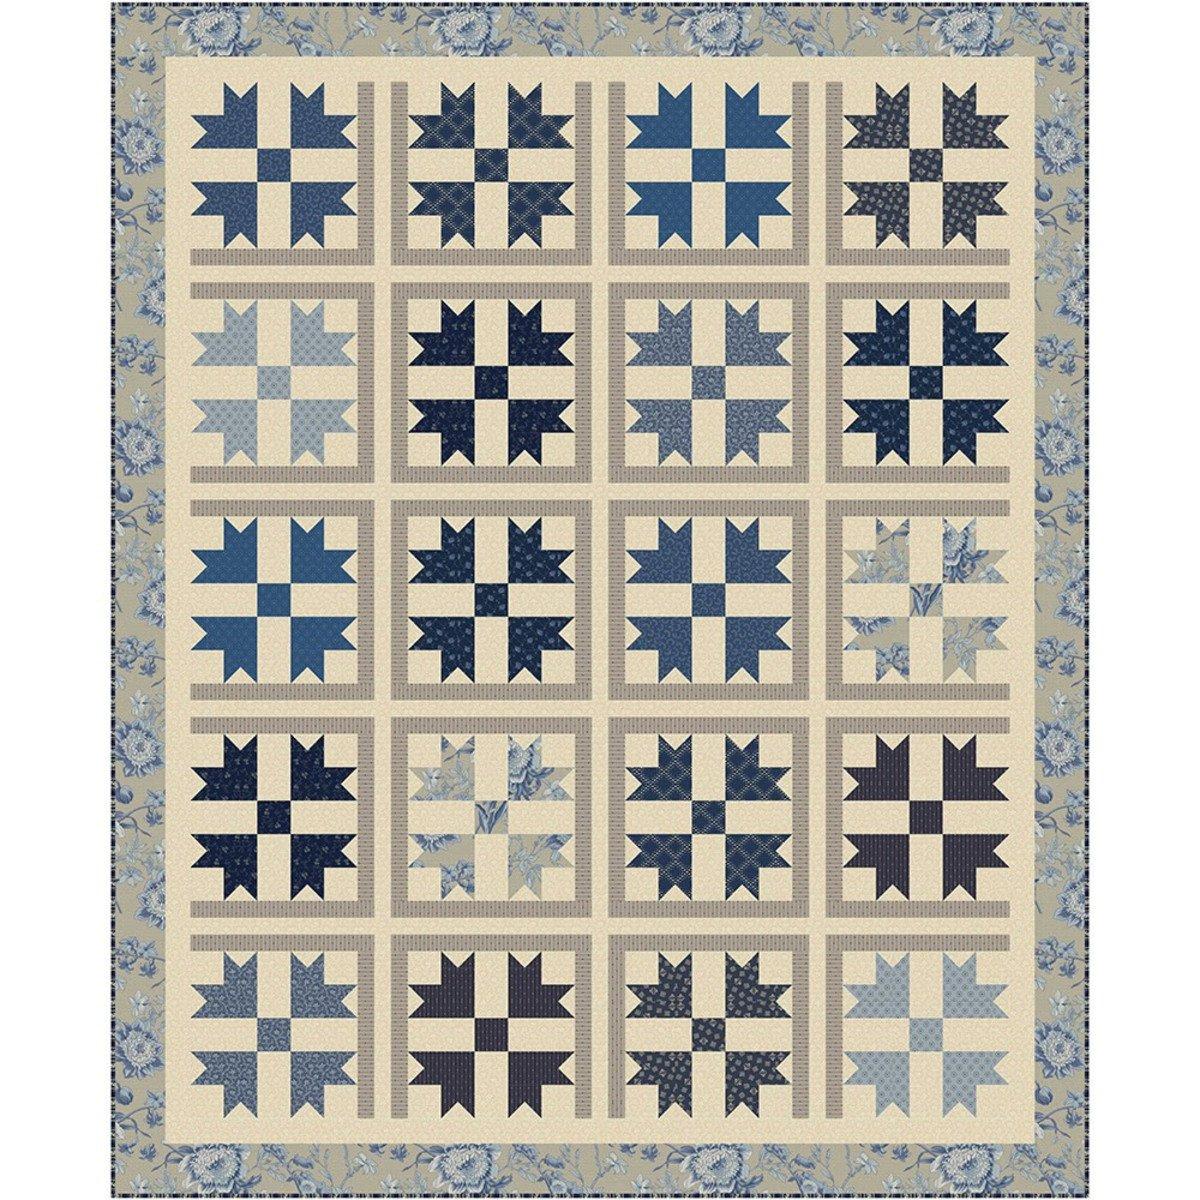 Blue Beauties Quilt Kit - PREORDER